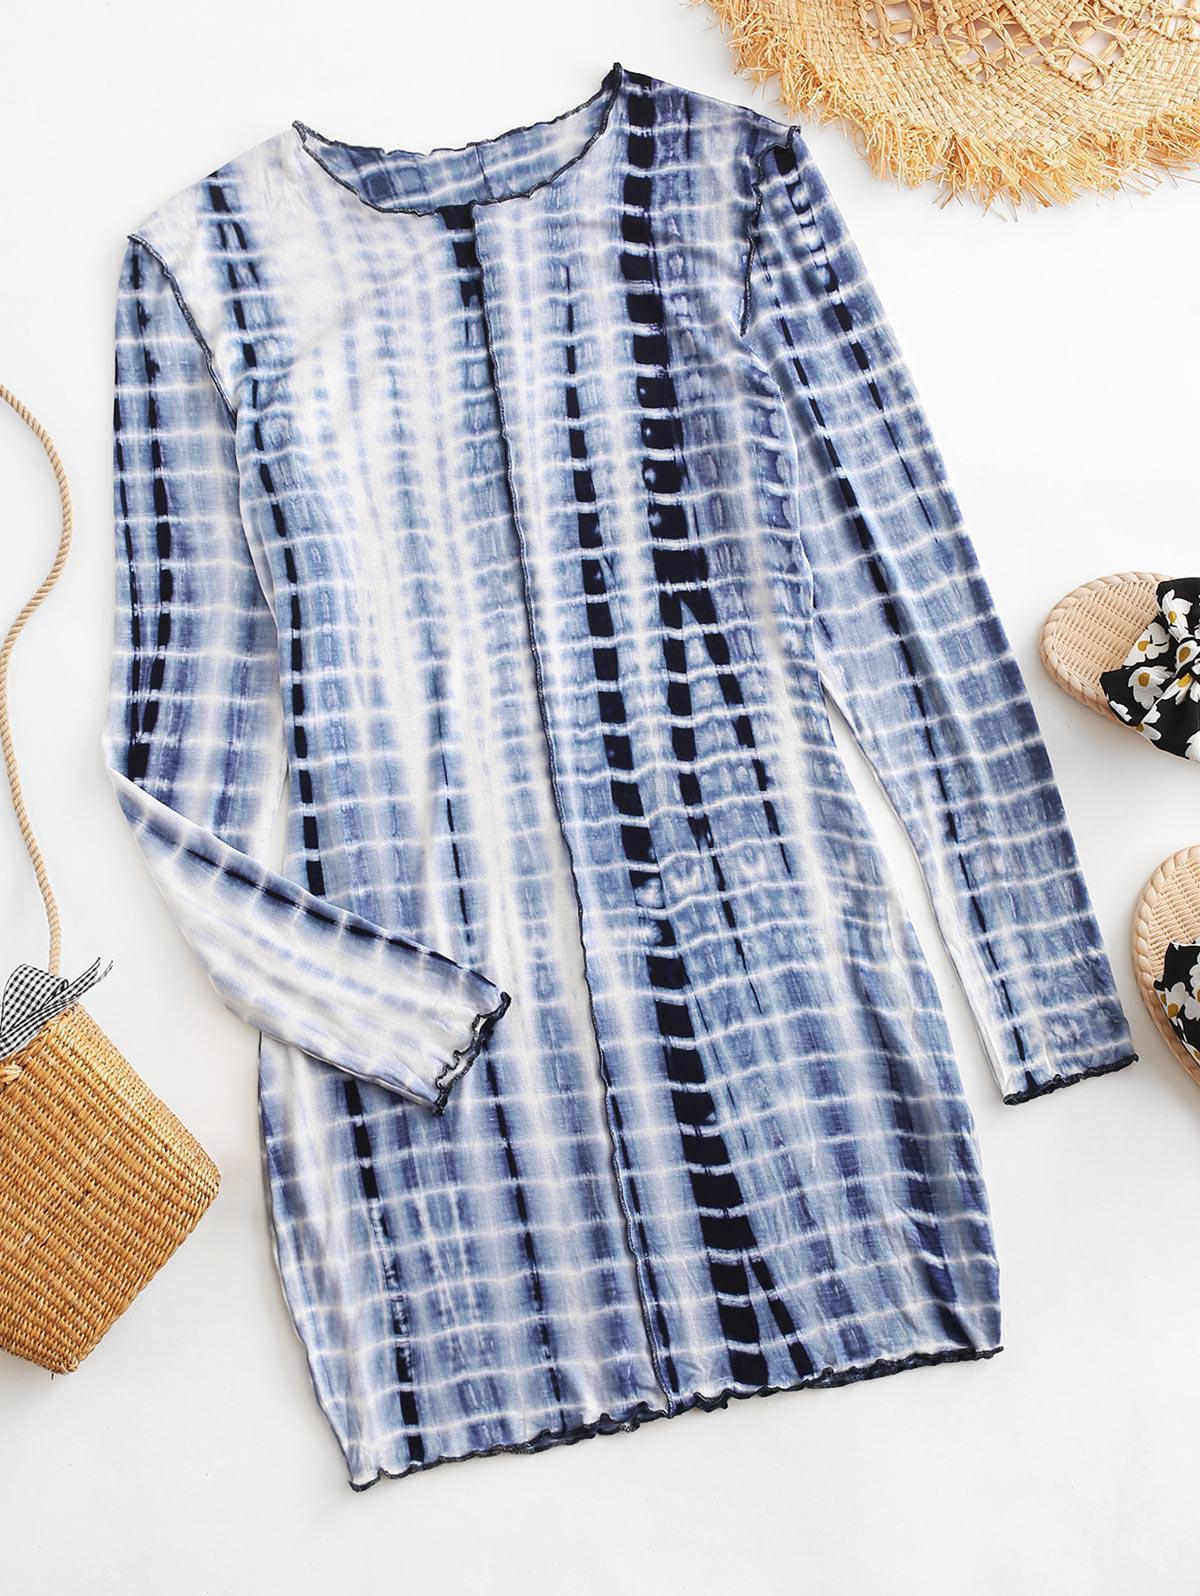 Long Sleeve Tie Dye Stitching Mini Dress